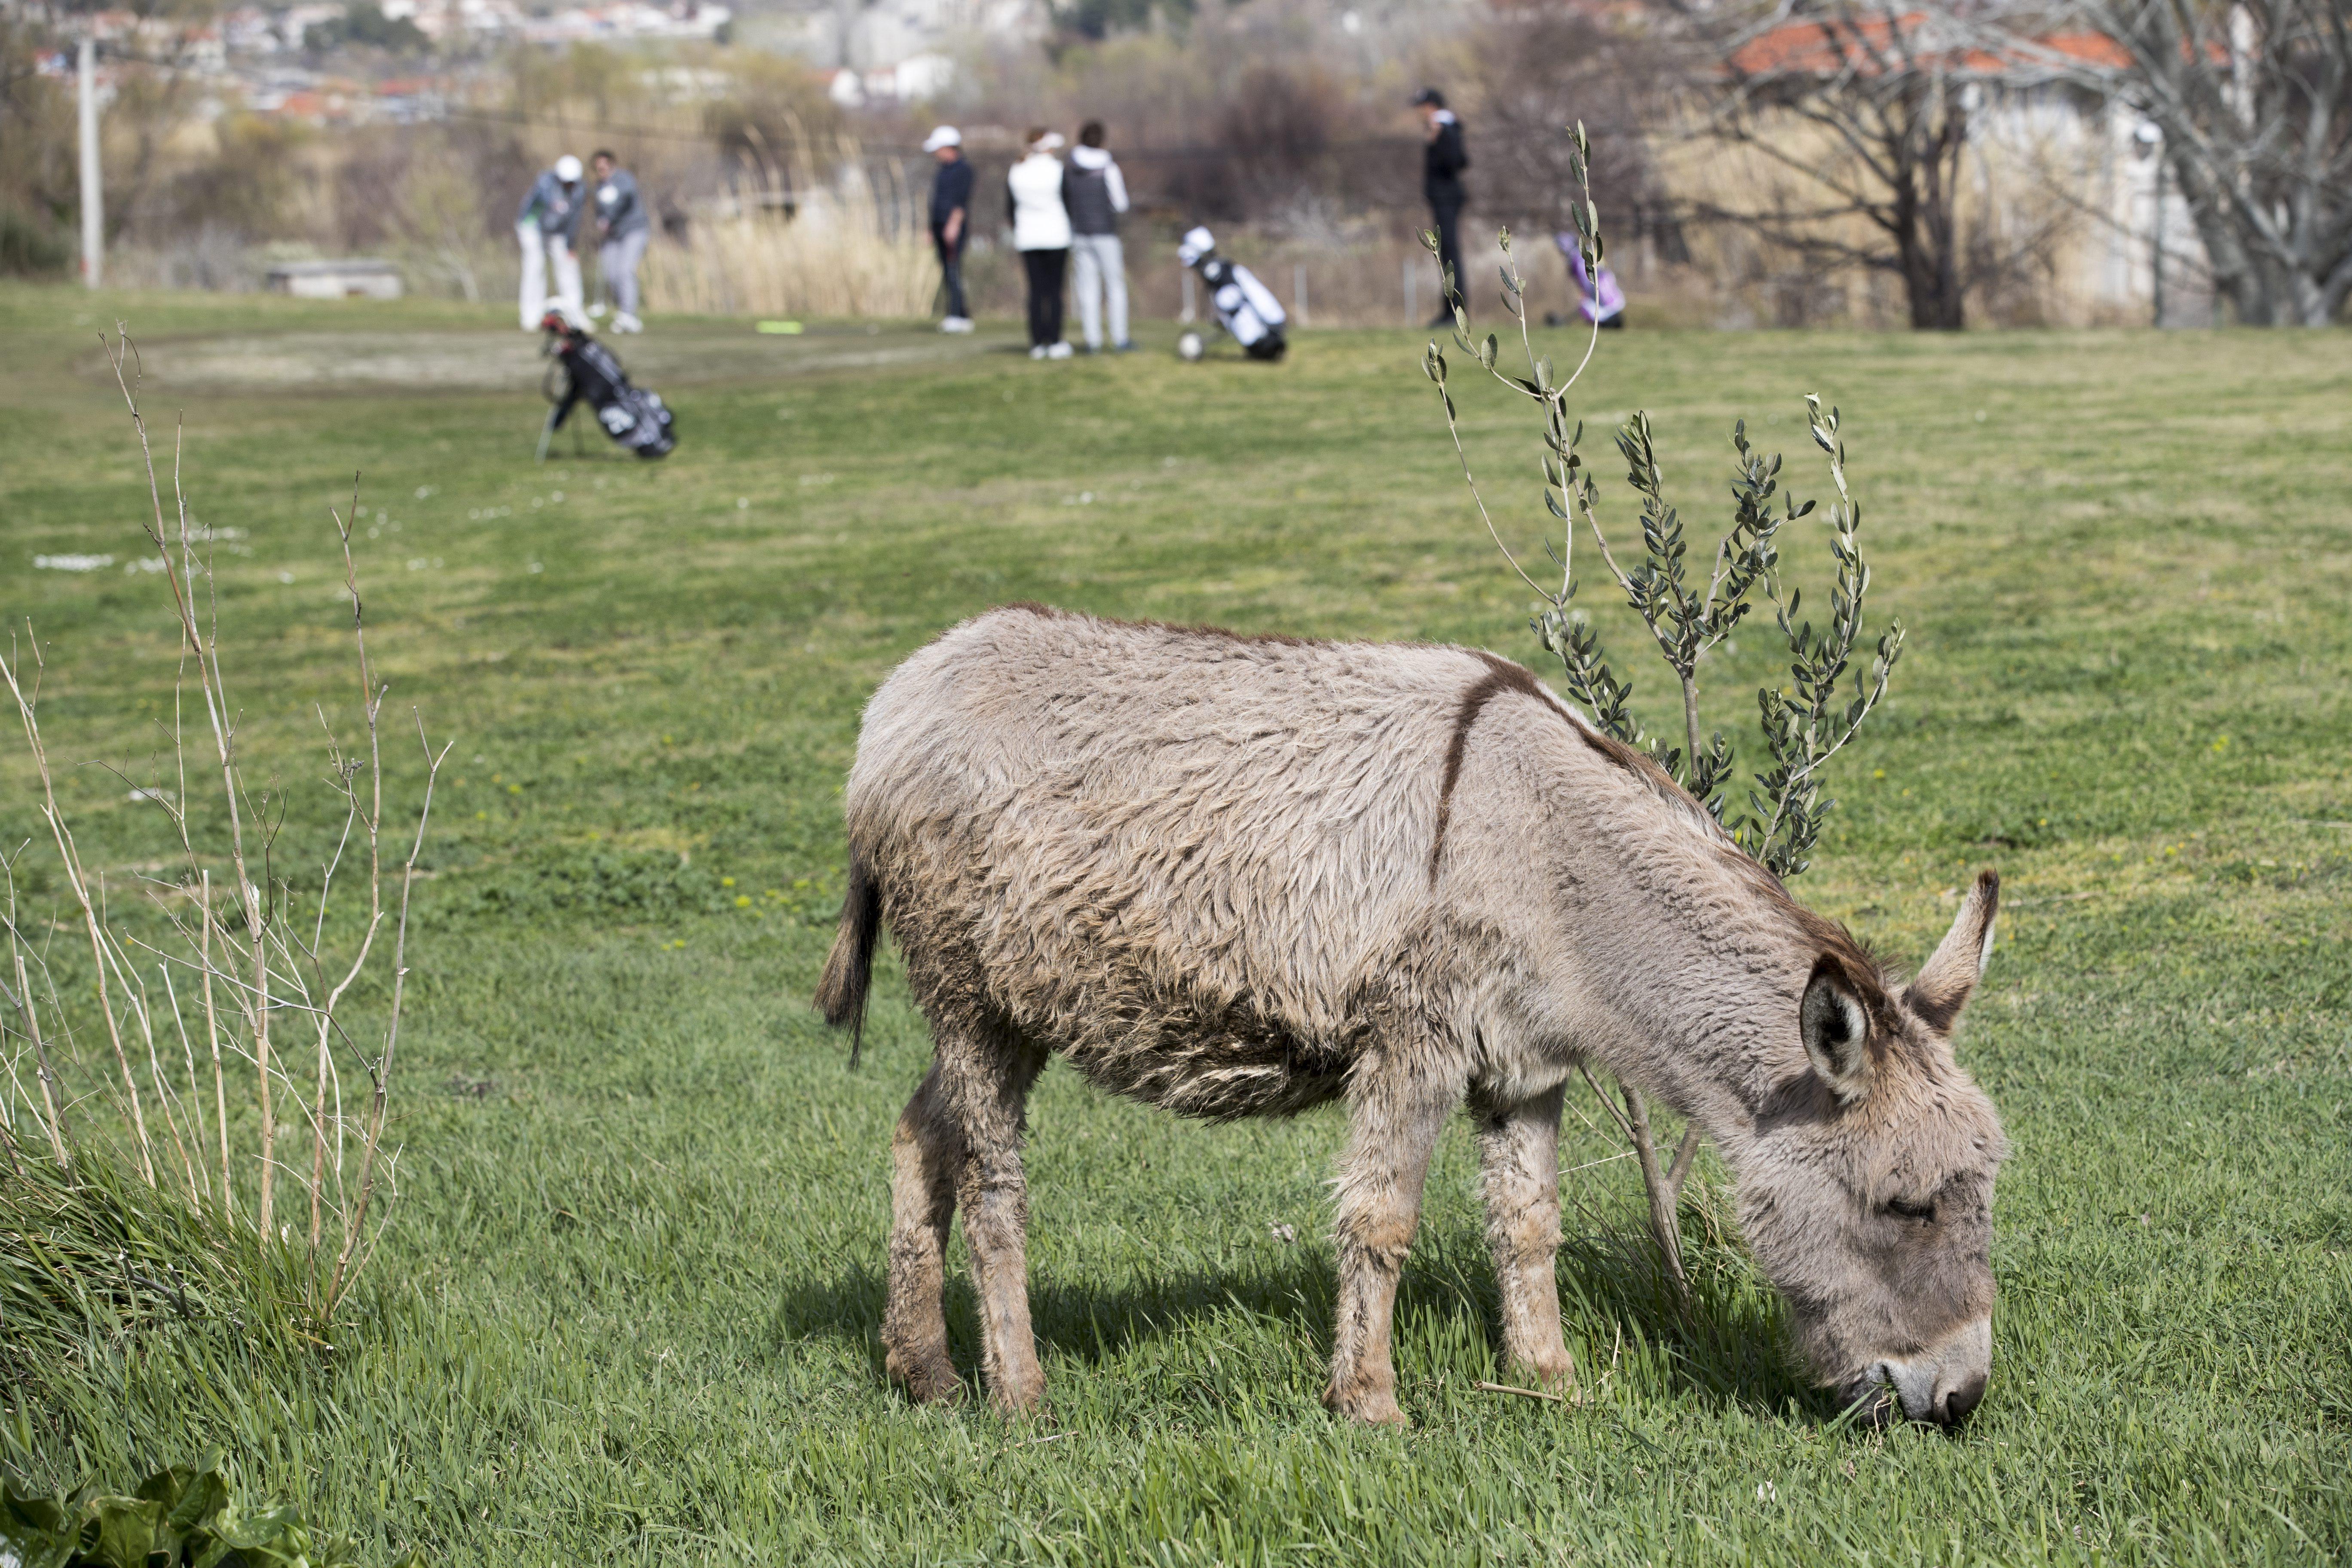 Golf, Donkey, Sport, Field